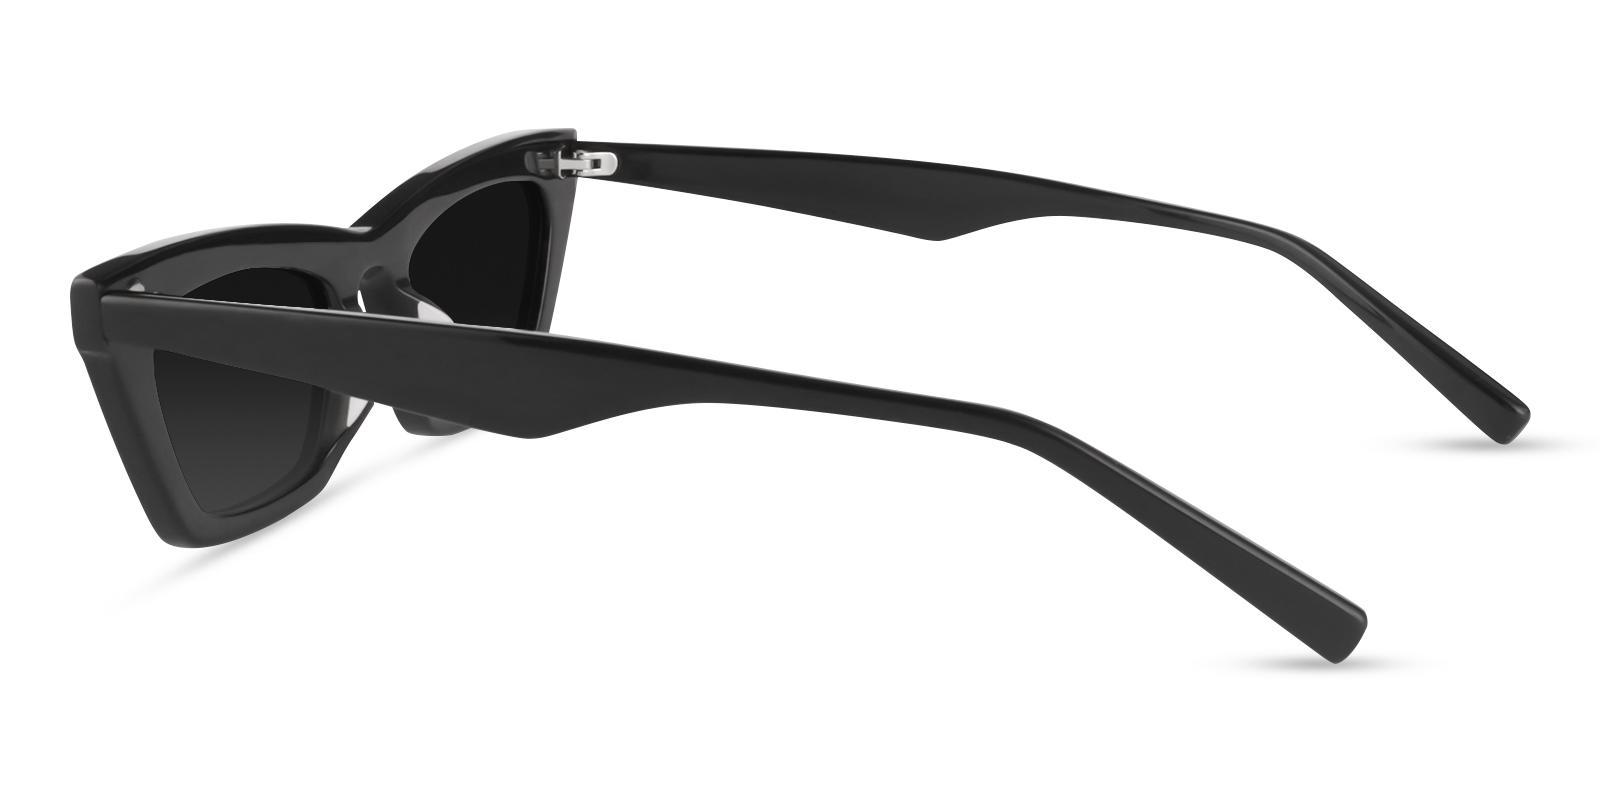 KJ Black Acetate Fashion , Sunglasses , UniversalBridgeFit Frames from ABBE Glasses